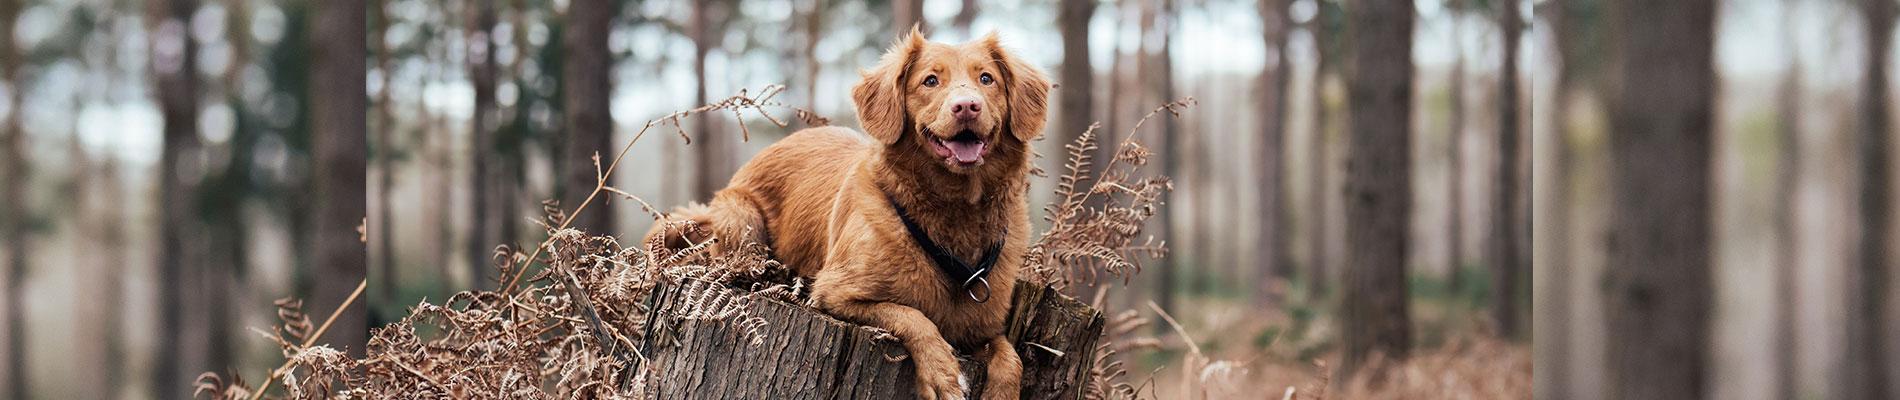 Dog Grooming Indiana